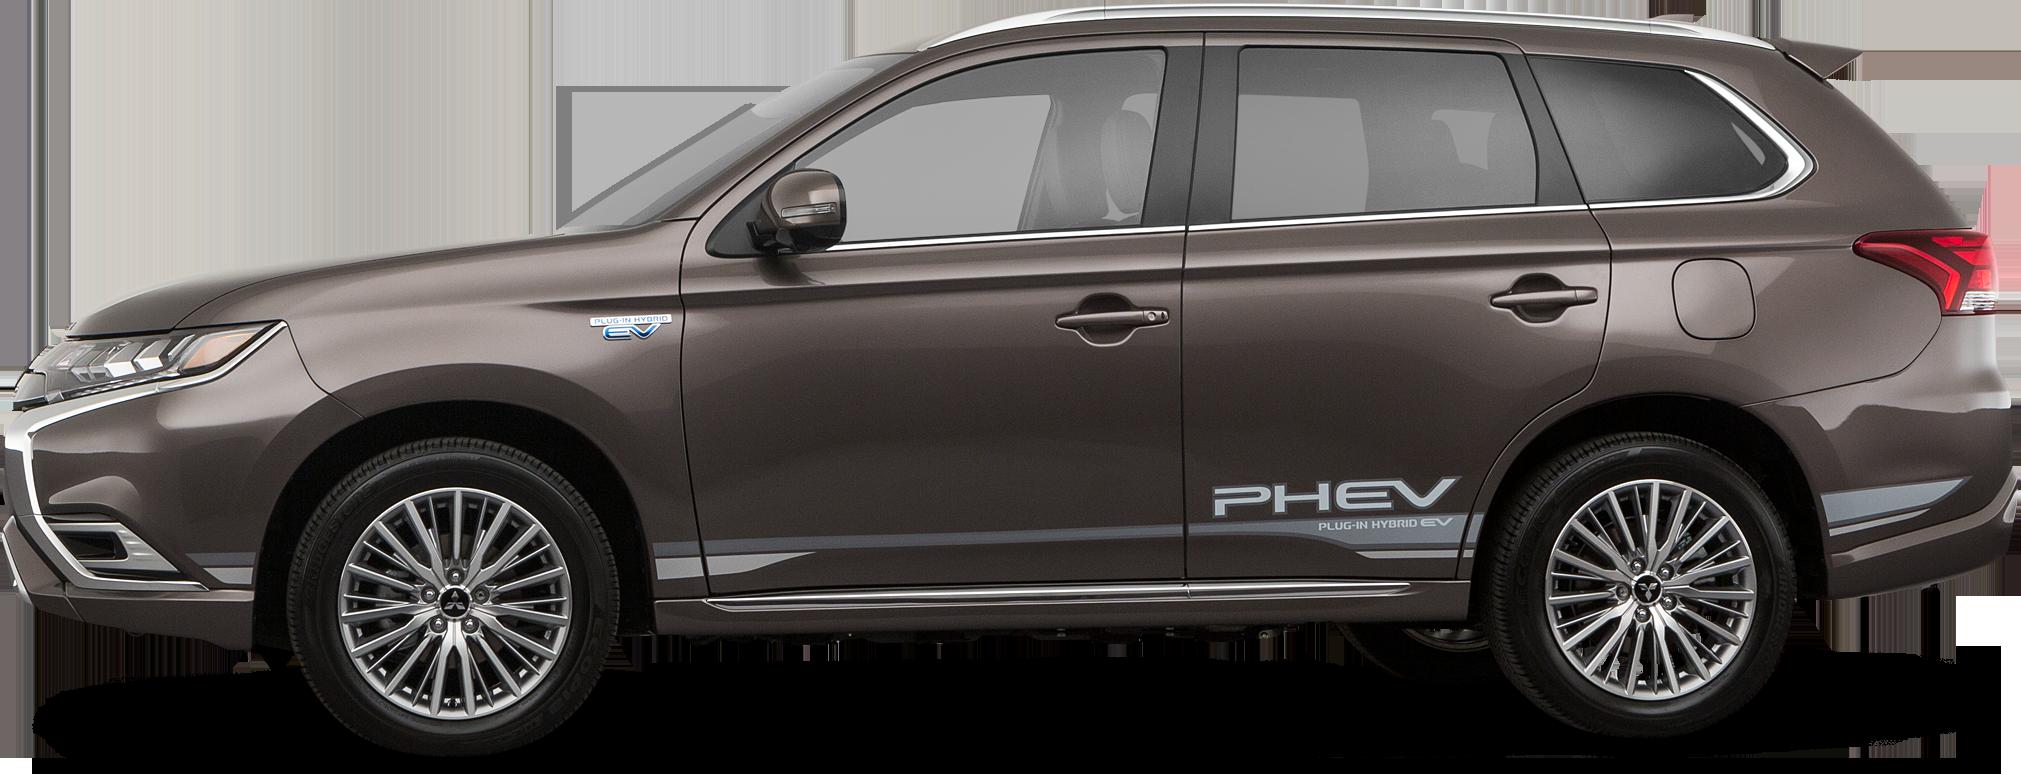 2020 Mitsubishi Outlander PHEV CUV GT